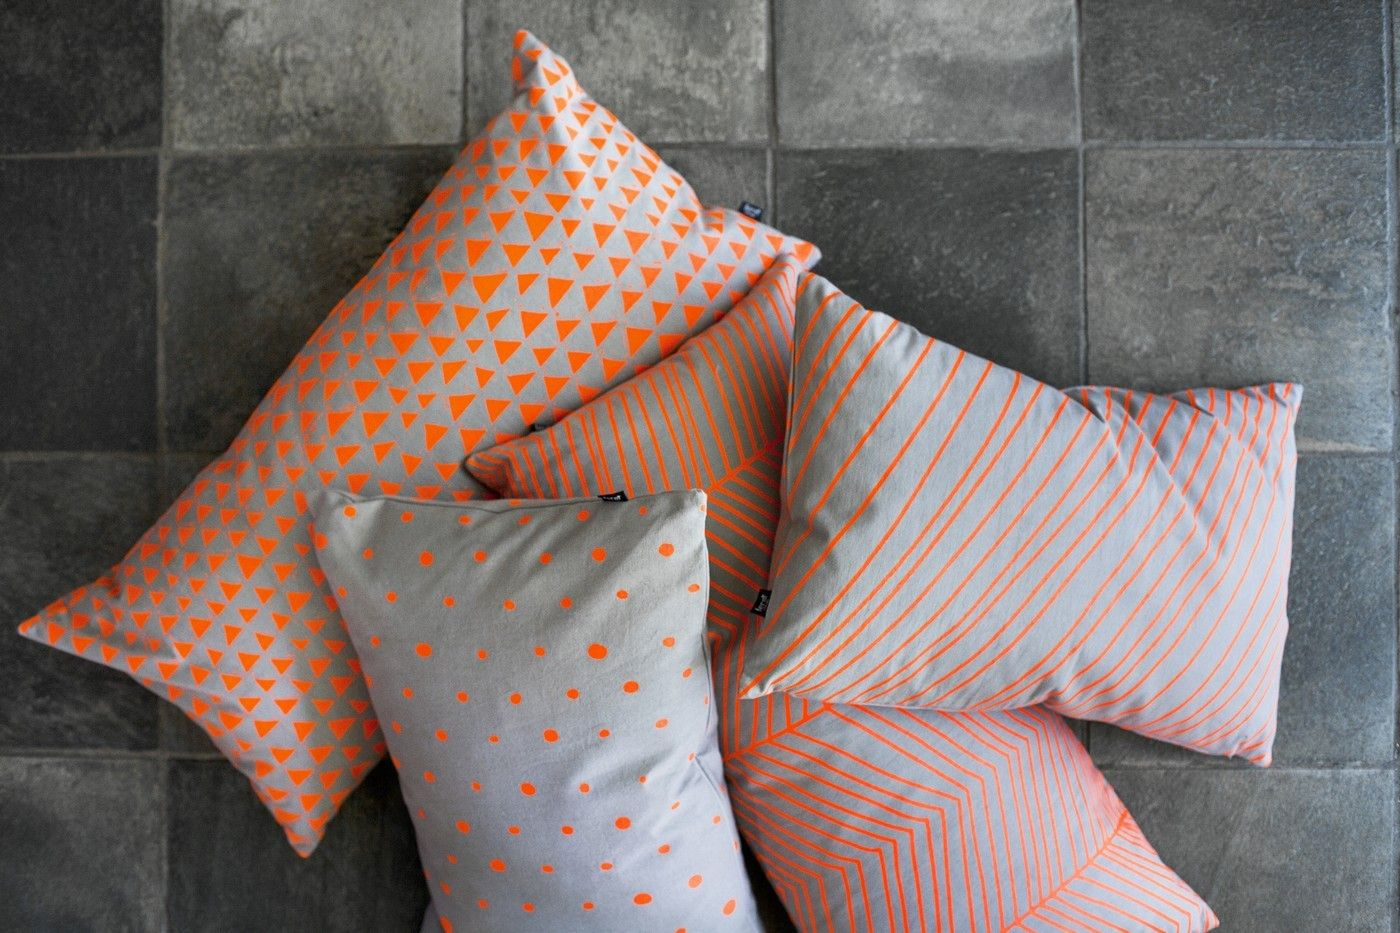 coussin striped small 60x40 cm orange gris ferm living. Black Bedroom Furniture Sets. Home Design Ideas